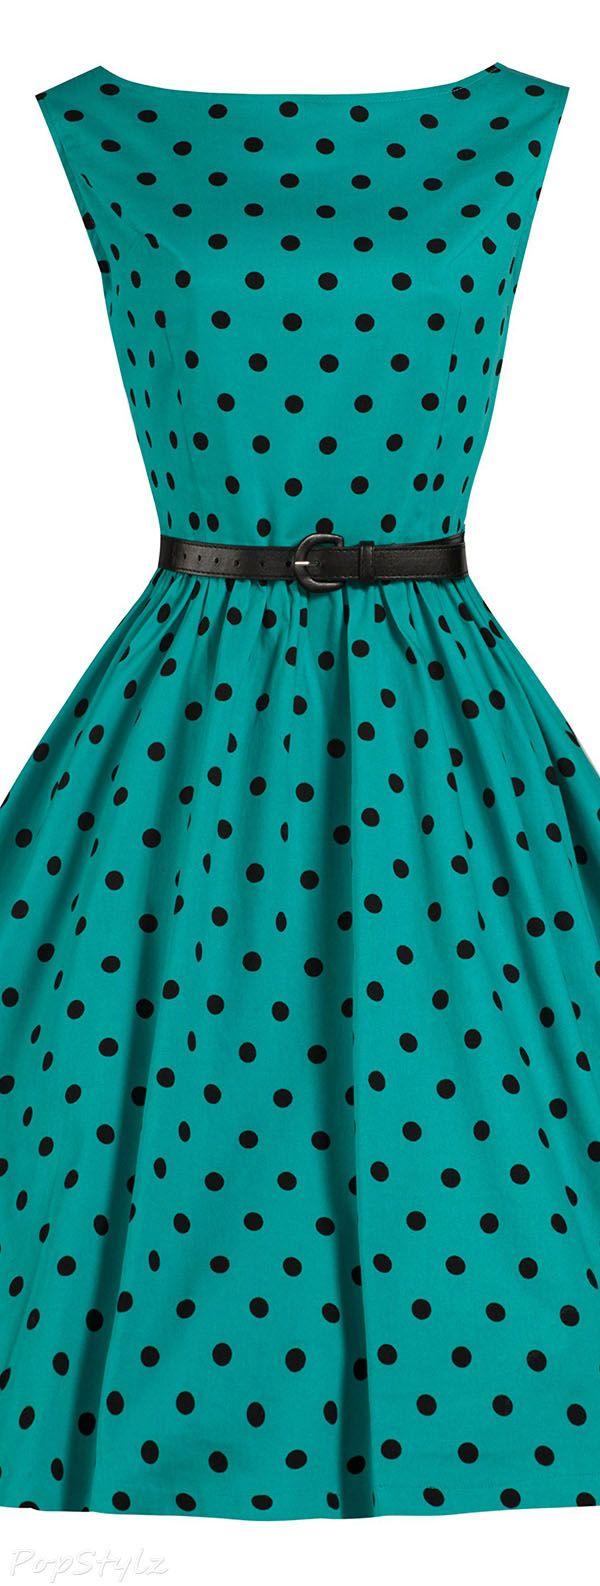 Polka Dot Vintage 1950's Swing/Jive Dress